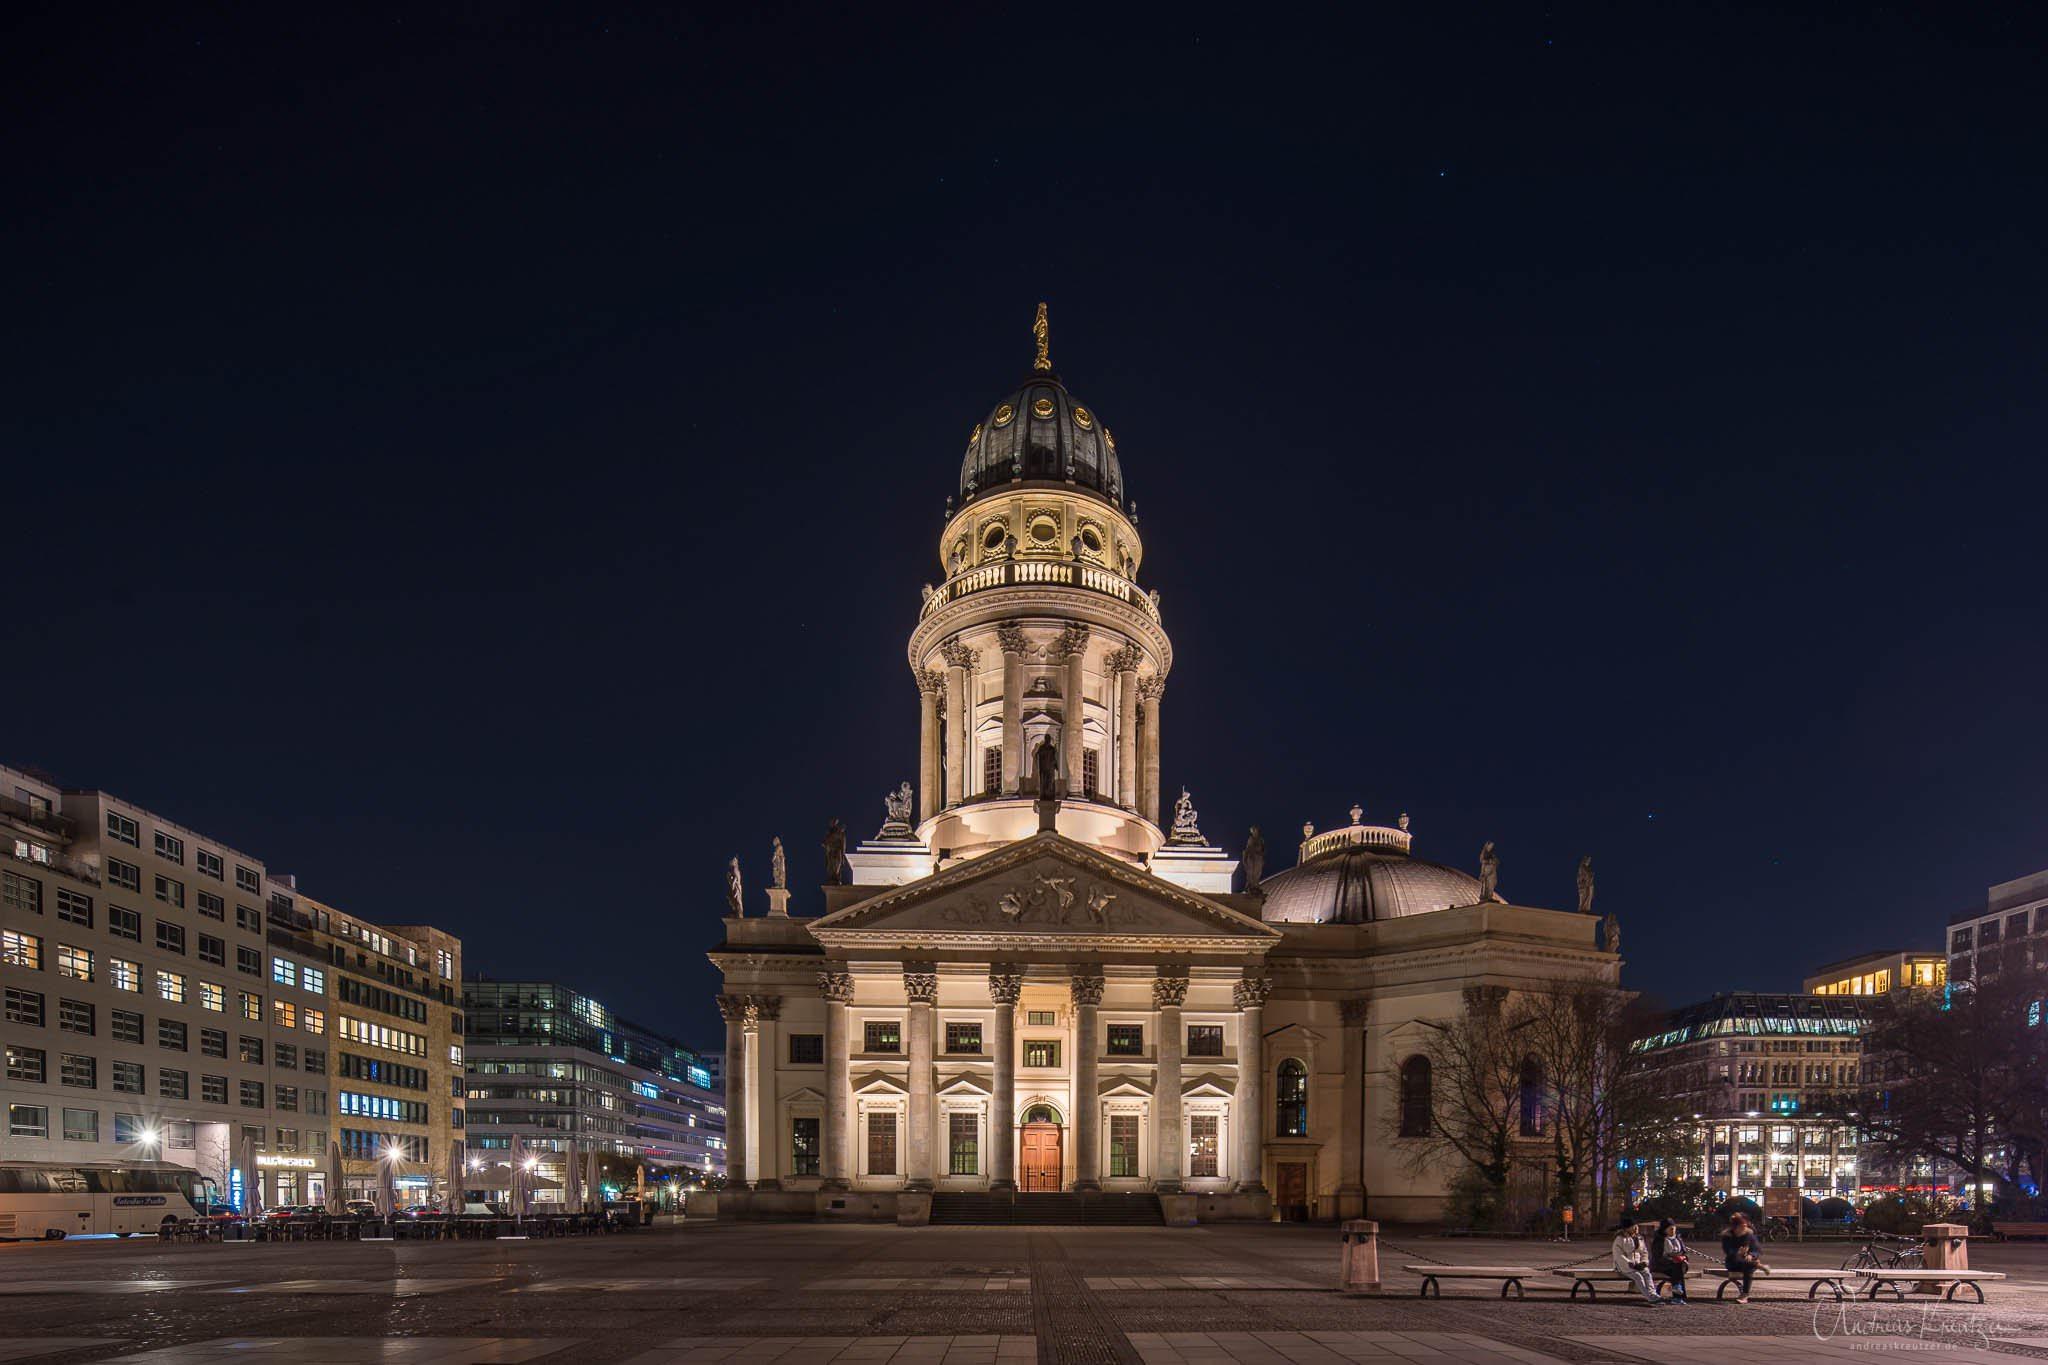 Deutscher Dom am Gendarmenmarkt in Berlin